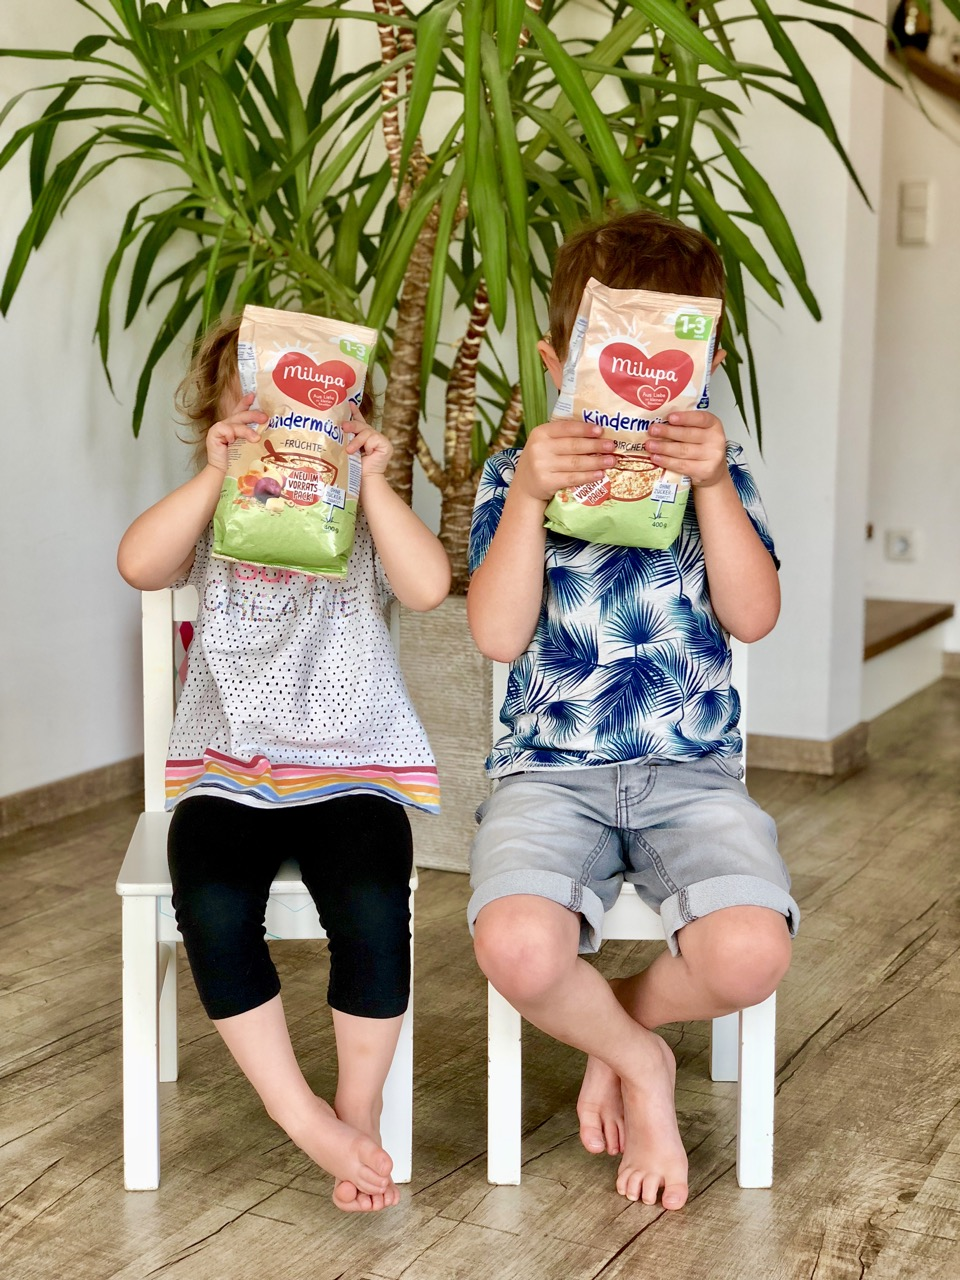 Gesund Frühstücken mit Kindern - Milupa Kindermüsli